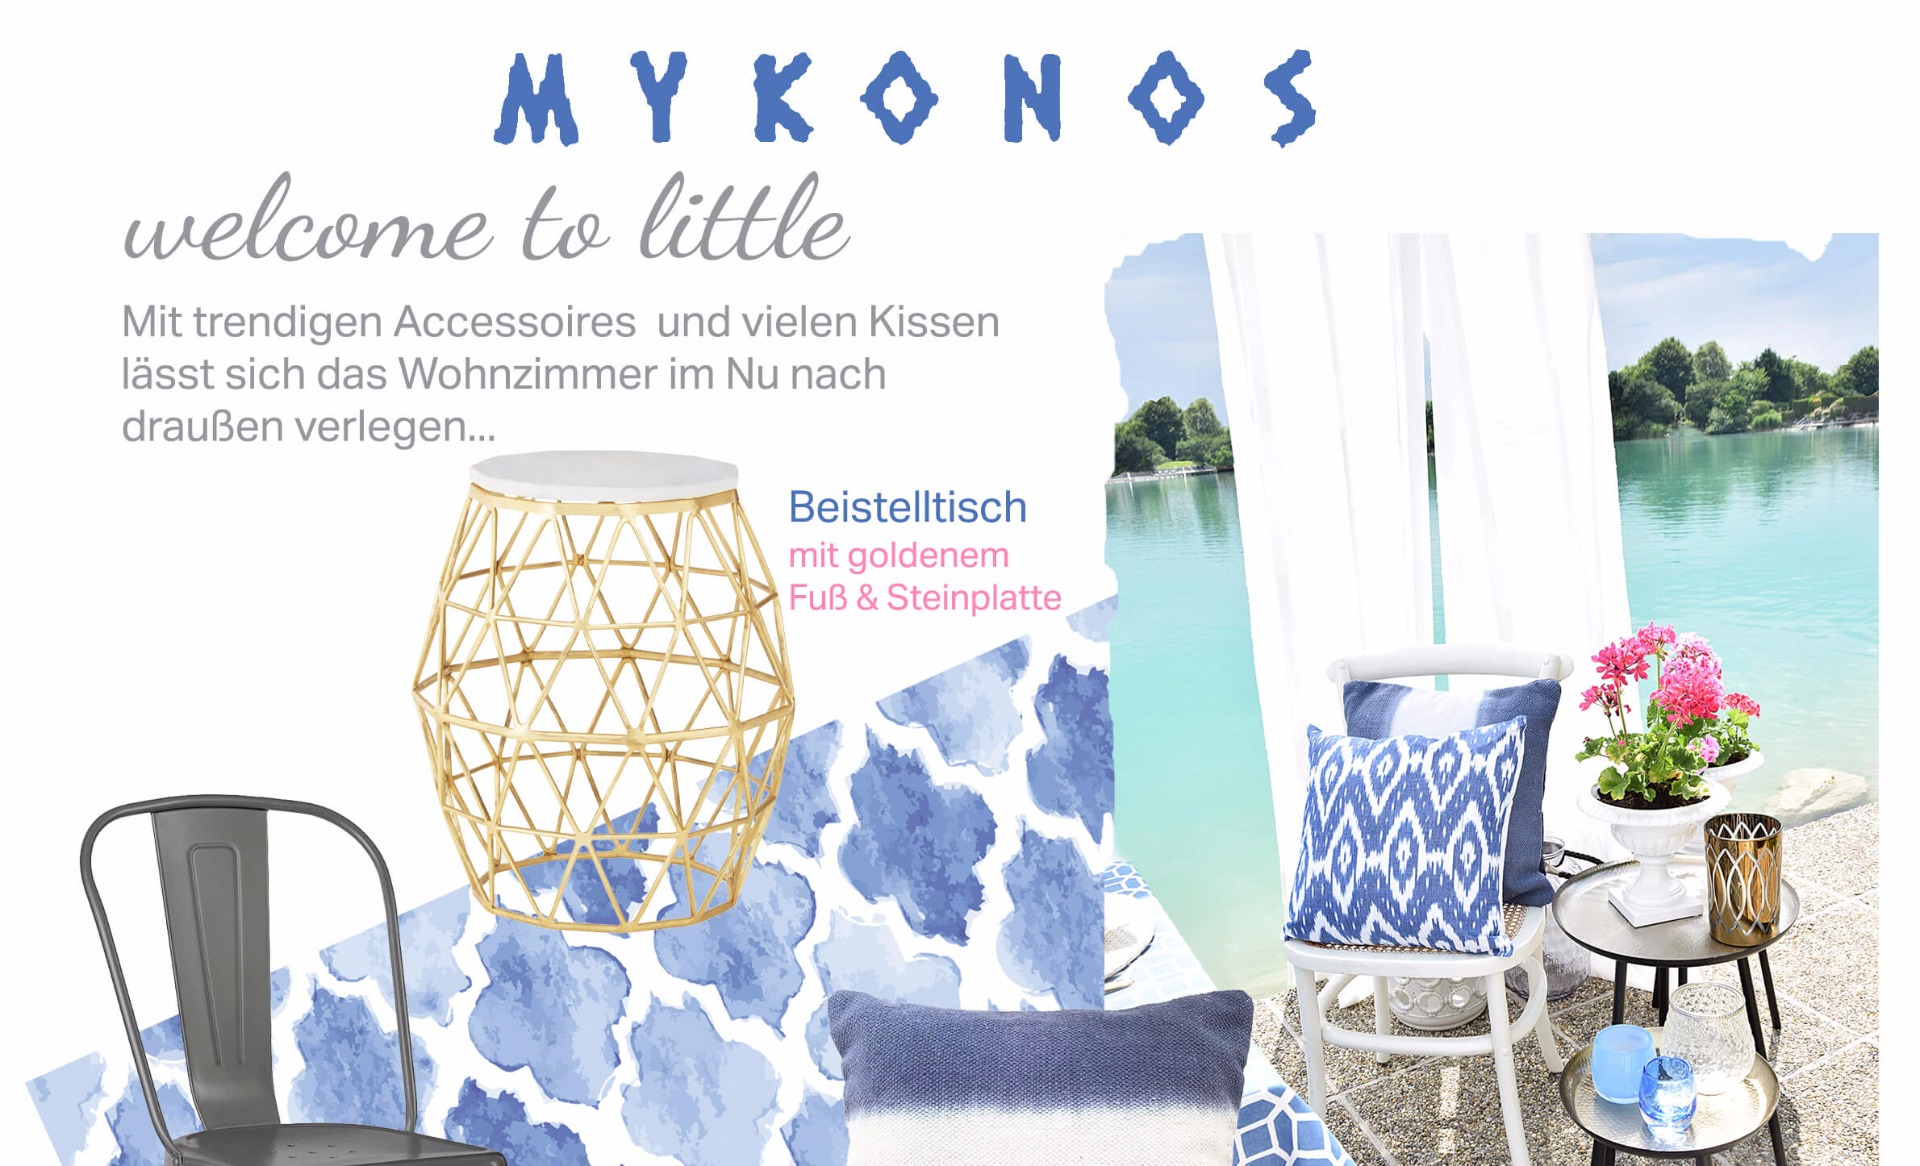 Neuer Look online! Mykonos-Style - #InstaShop